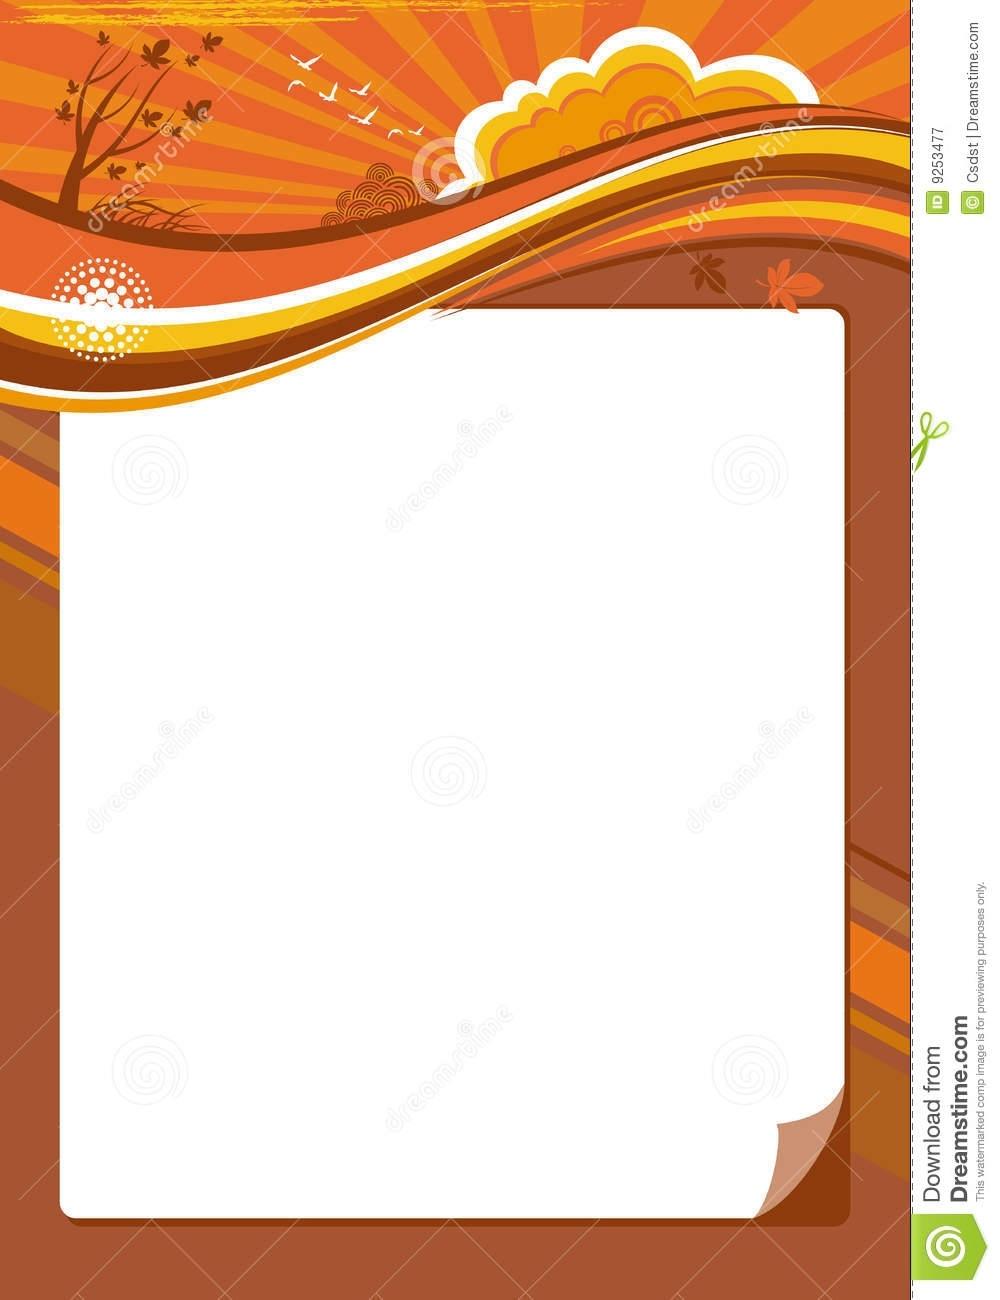 Calendar Template Stock Vector. Illustration Of Bird Free Calendar Background Templates